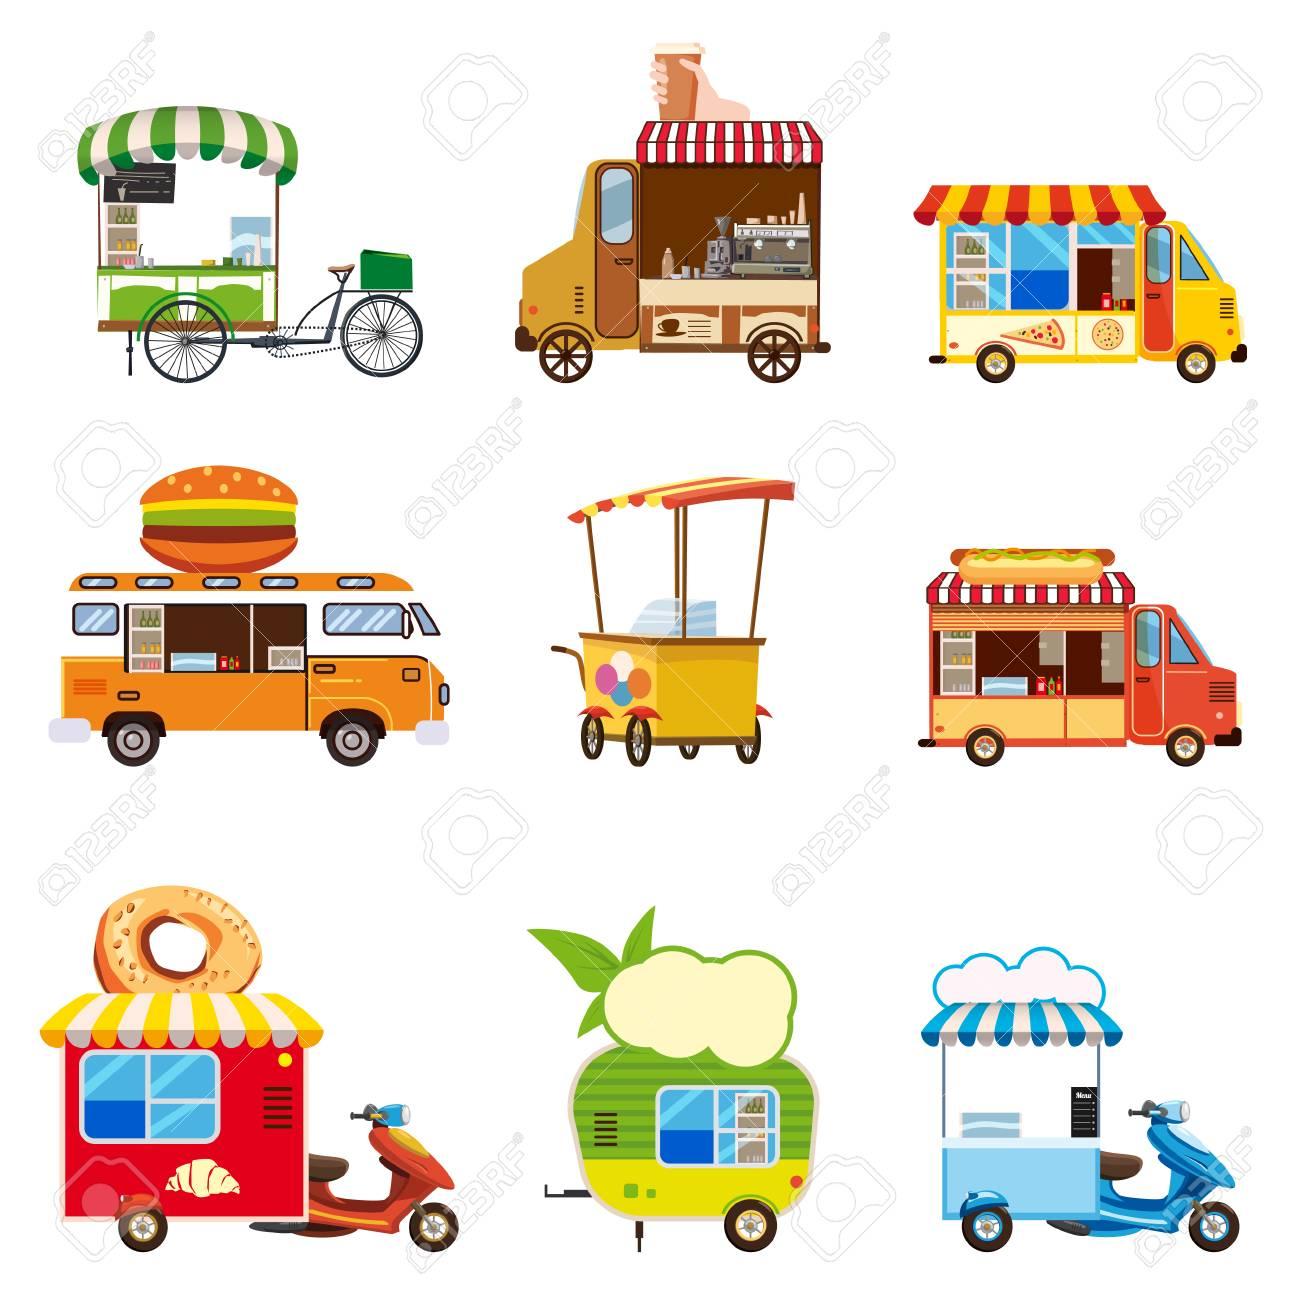 Set of street food car vehicles, buses, trucks, kiosks, pizza, BBQ, ice cream, vegan food, hot dog, baking, vector, illustration, isolated, cartoon style - 121565074